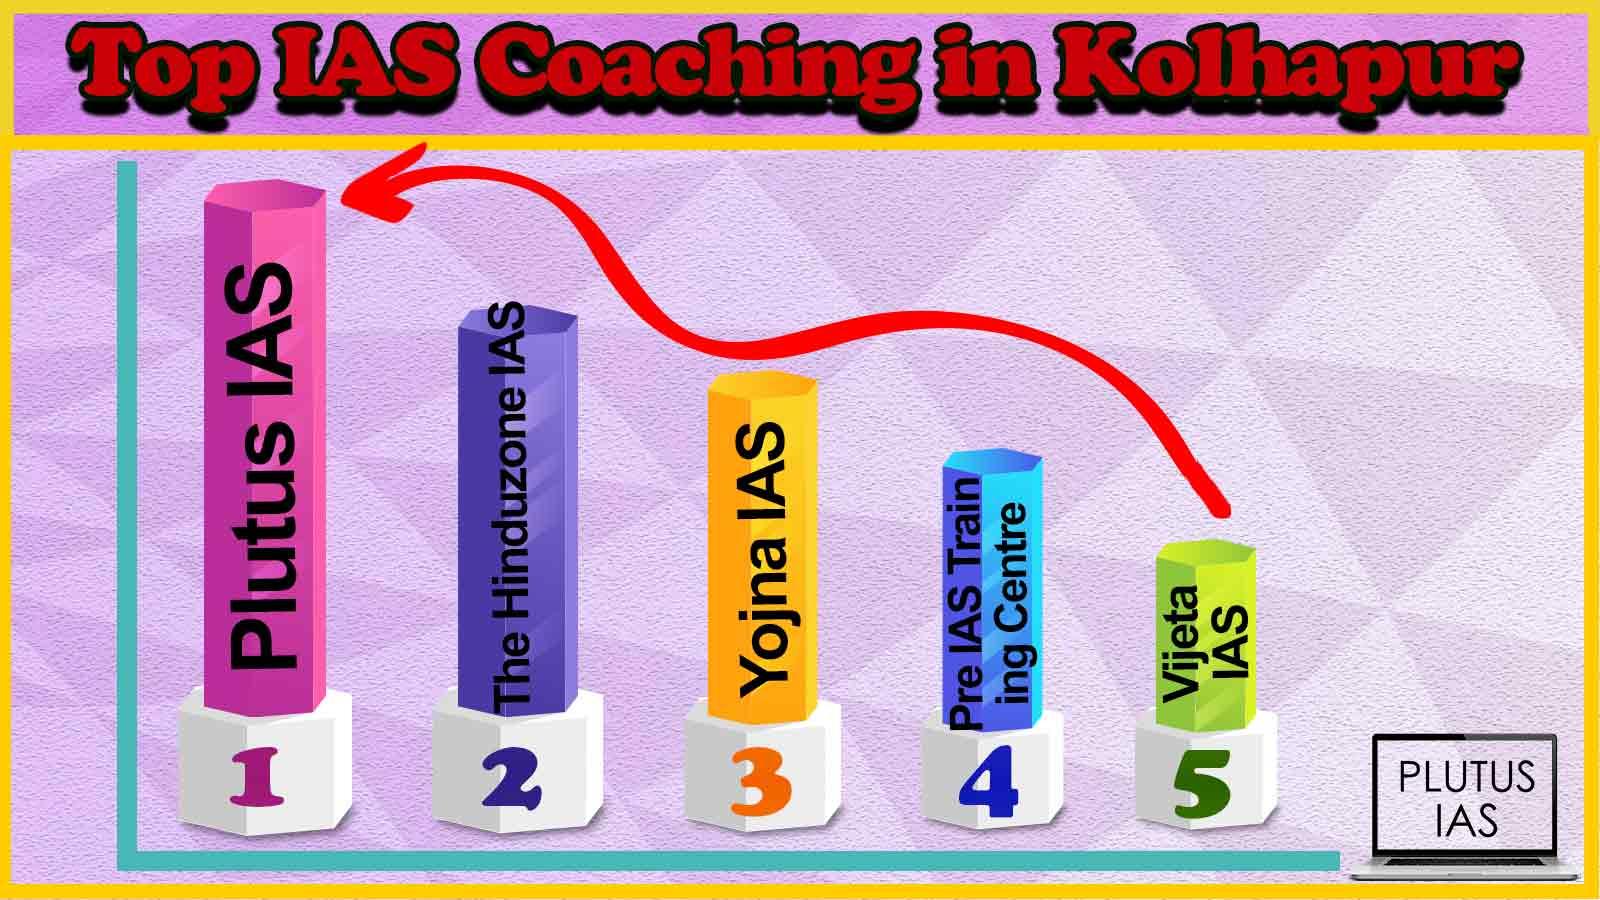 Best 10 IAS Coaching in Kolhapur